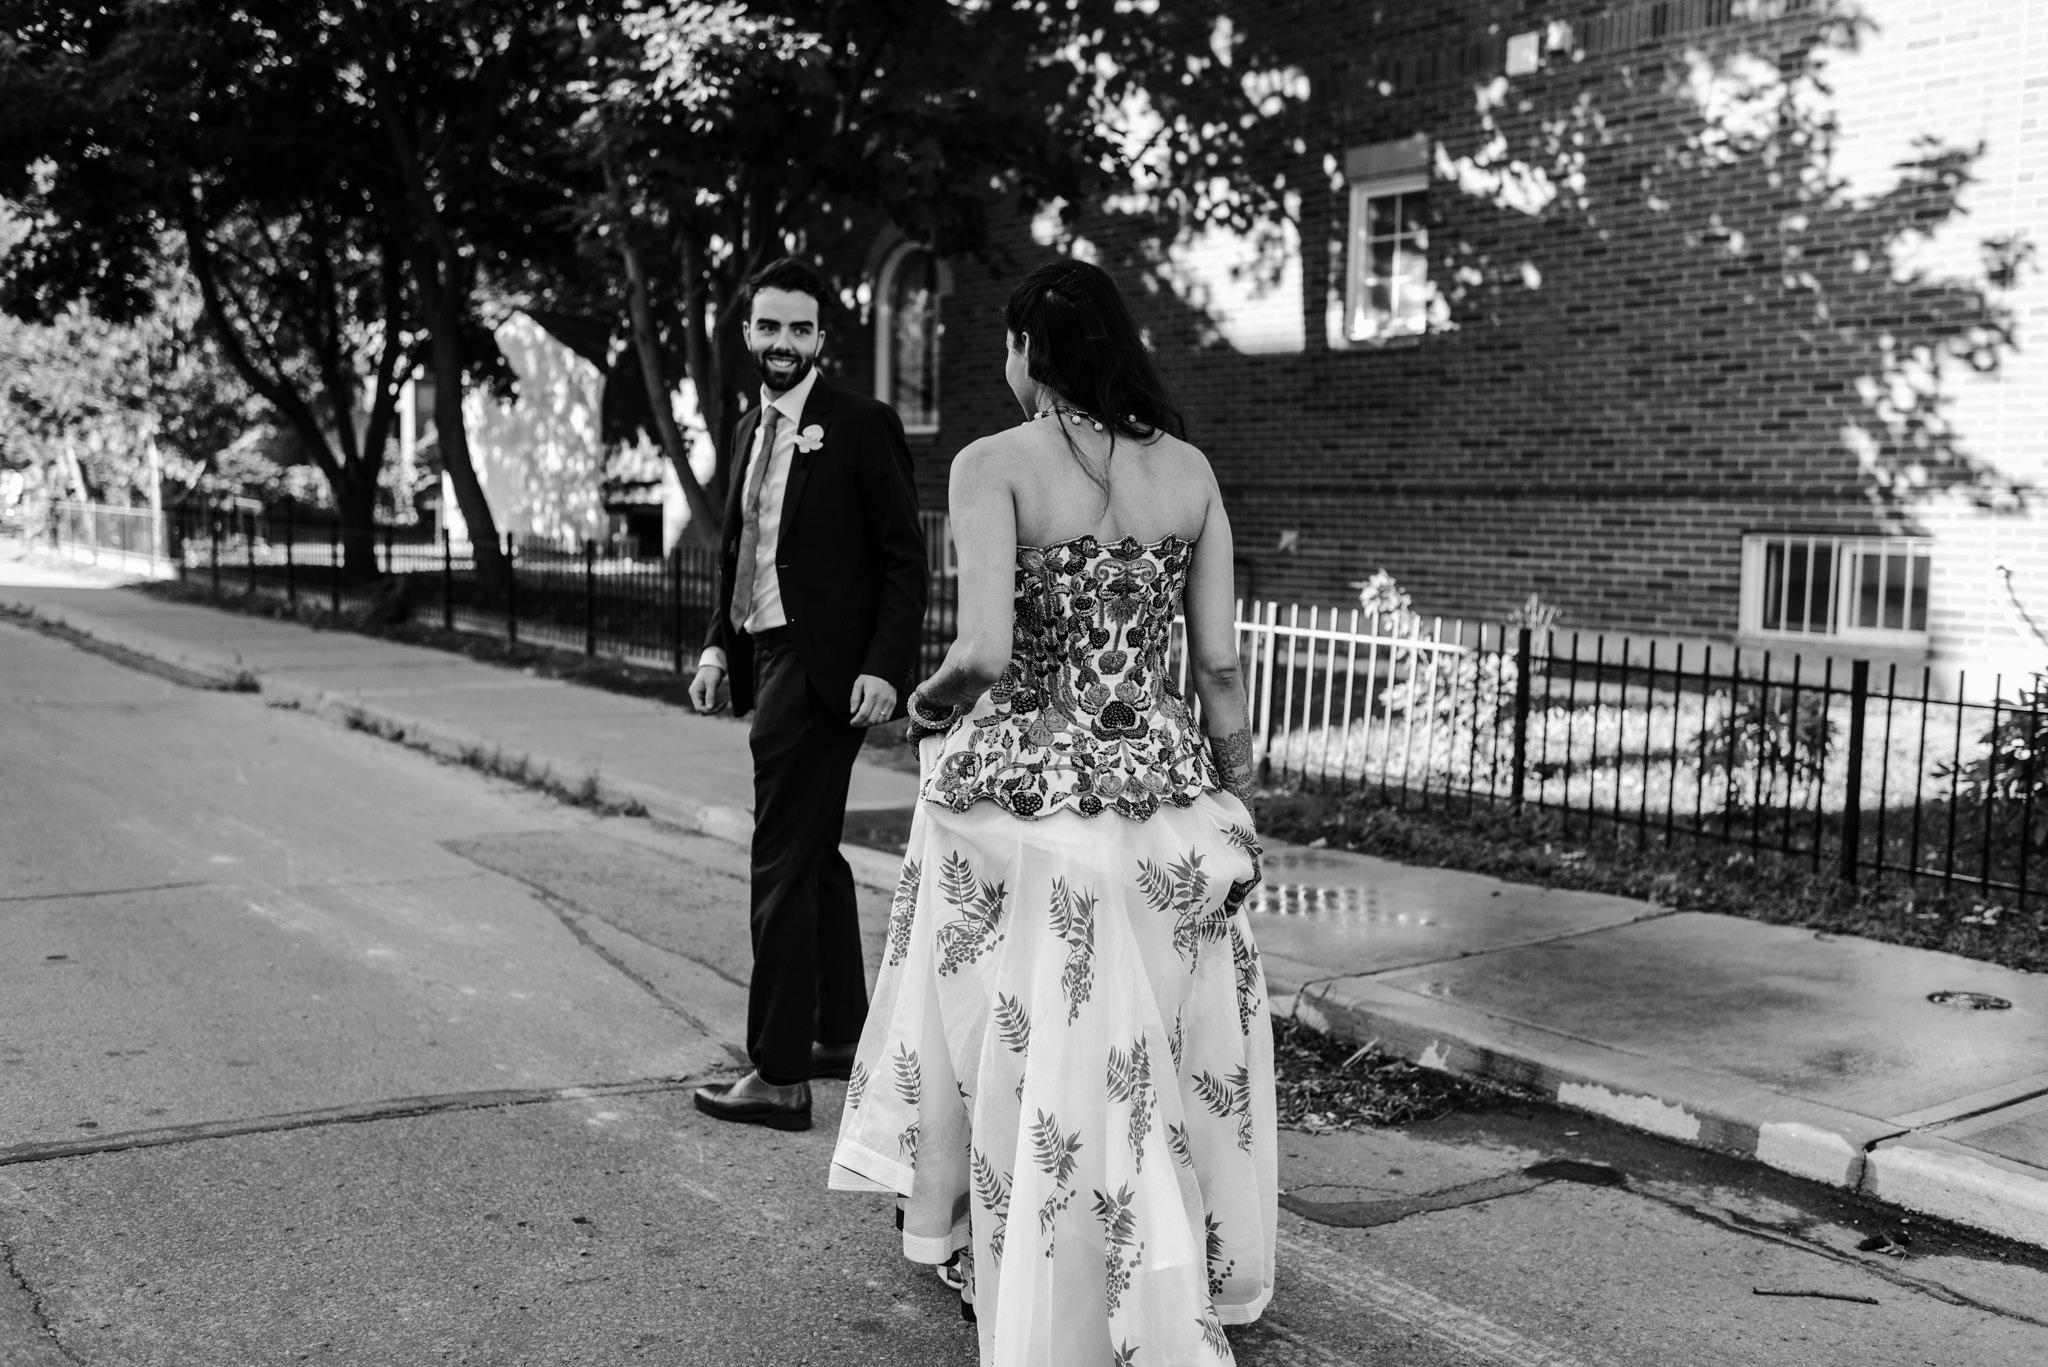 058-bride-groom-couple-wedding-photos-downtown-toronto-hotel-ocho.jpg